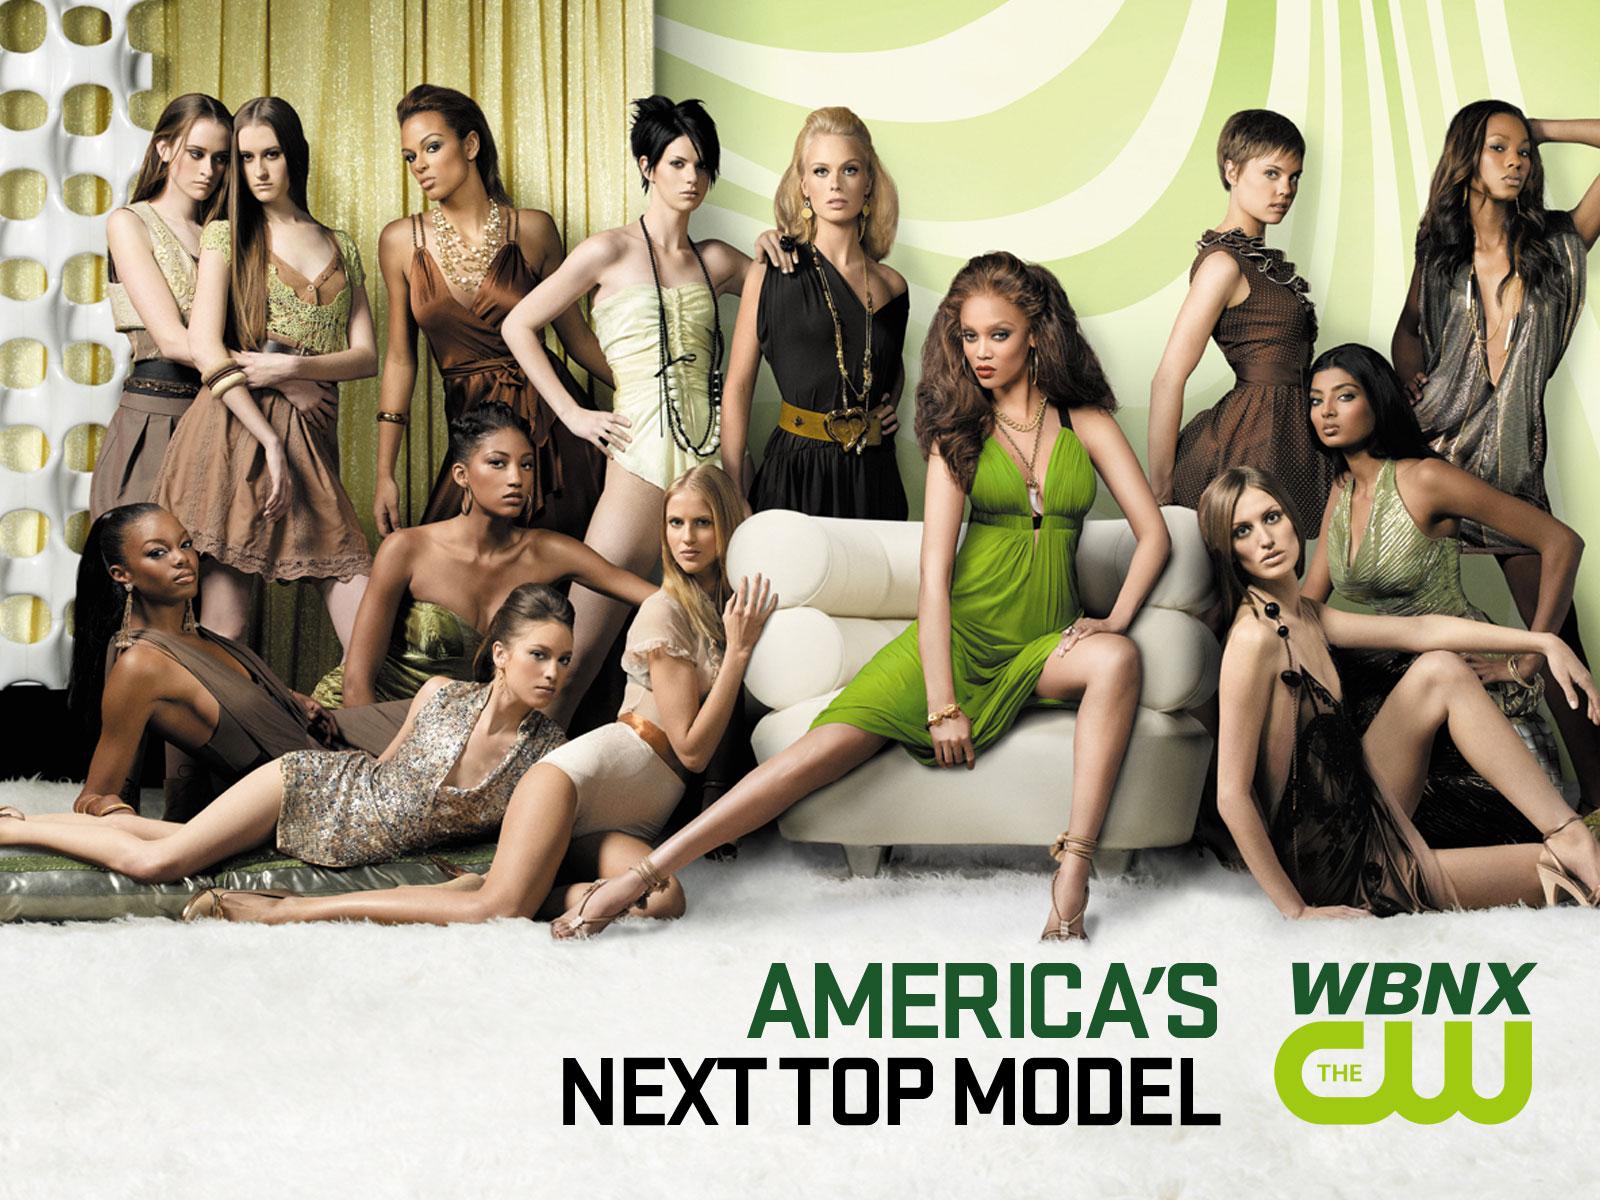 America's Next Top Model: Season 7